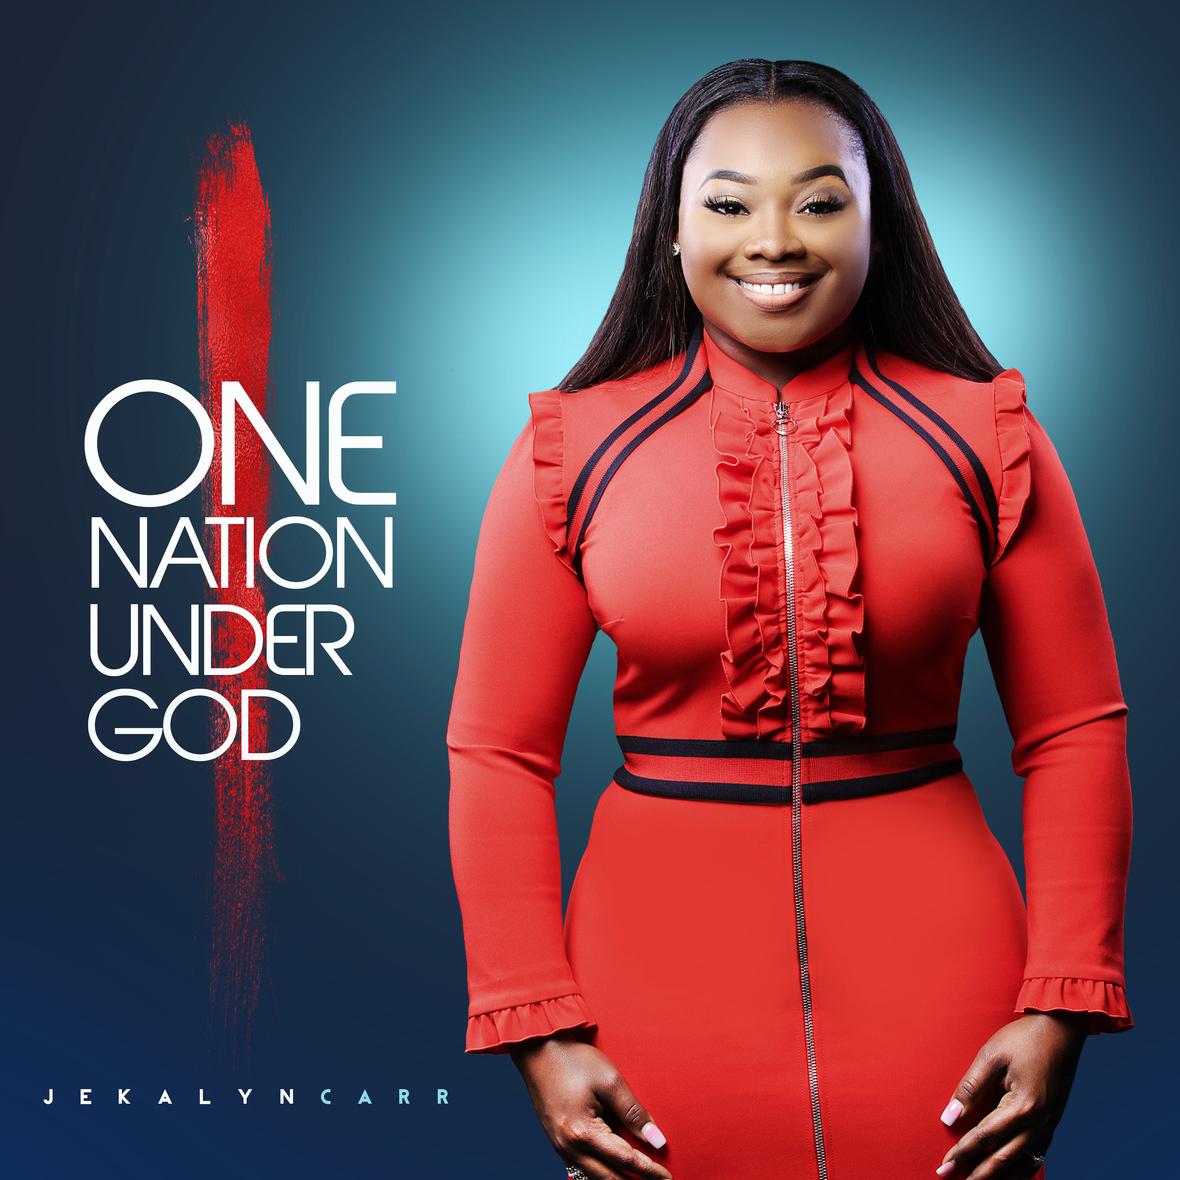 JC One Nation Under God album cover